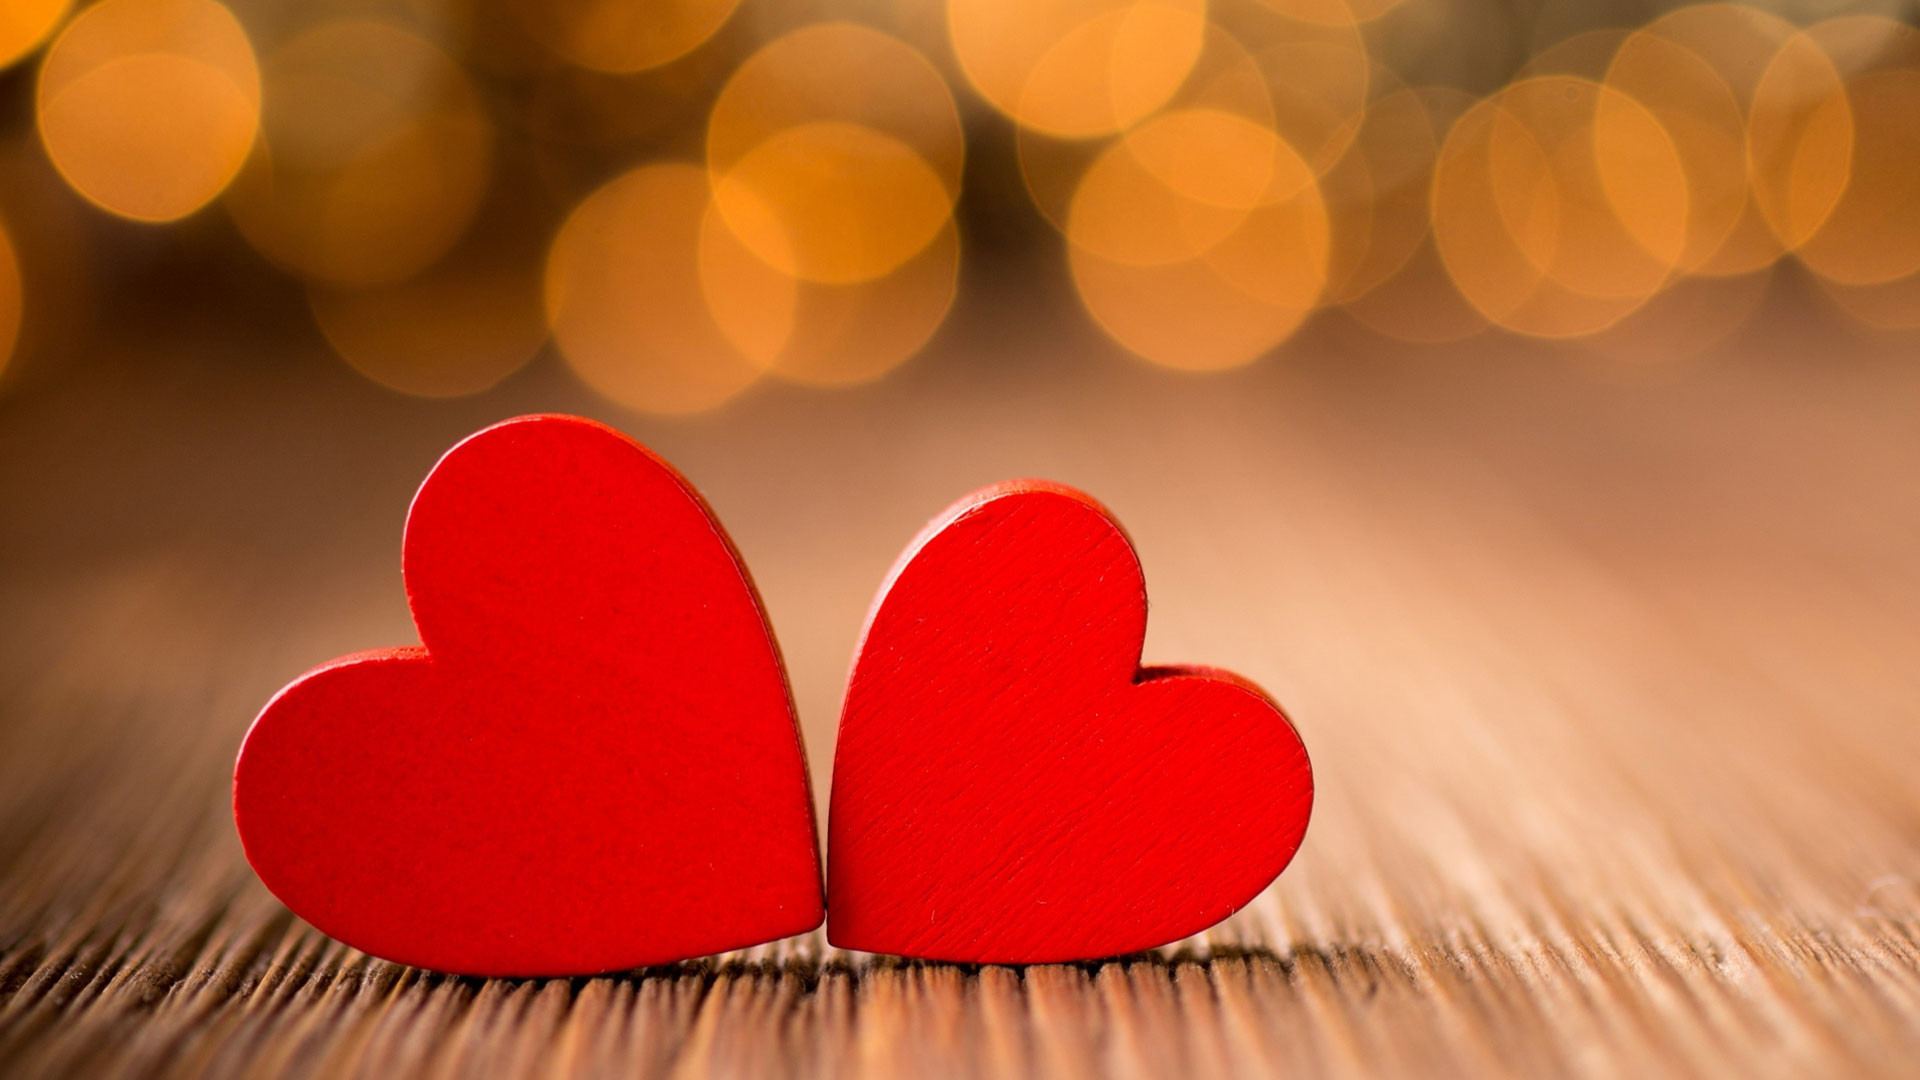 hd pics photos love red love hearts pair macro desktop background wallpaper